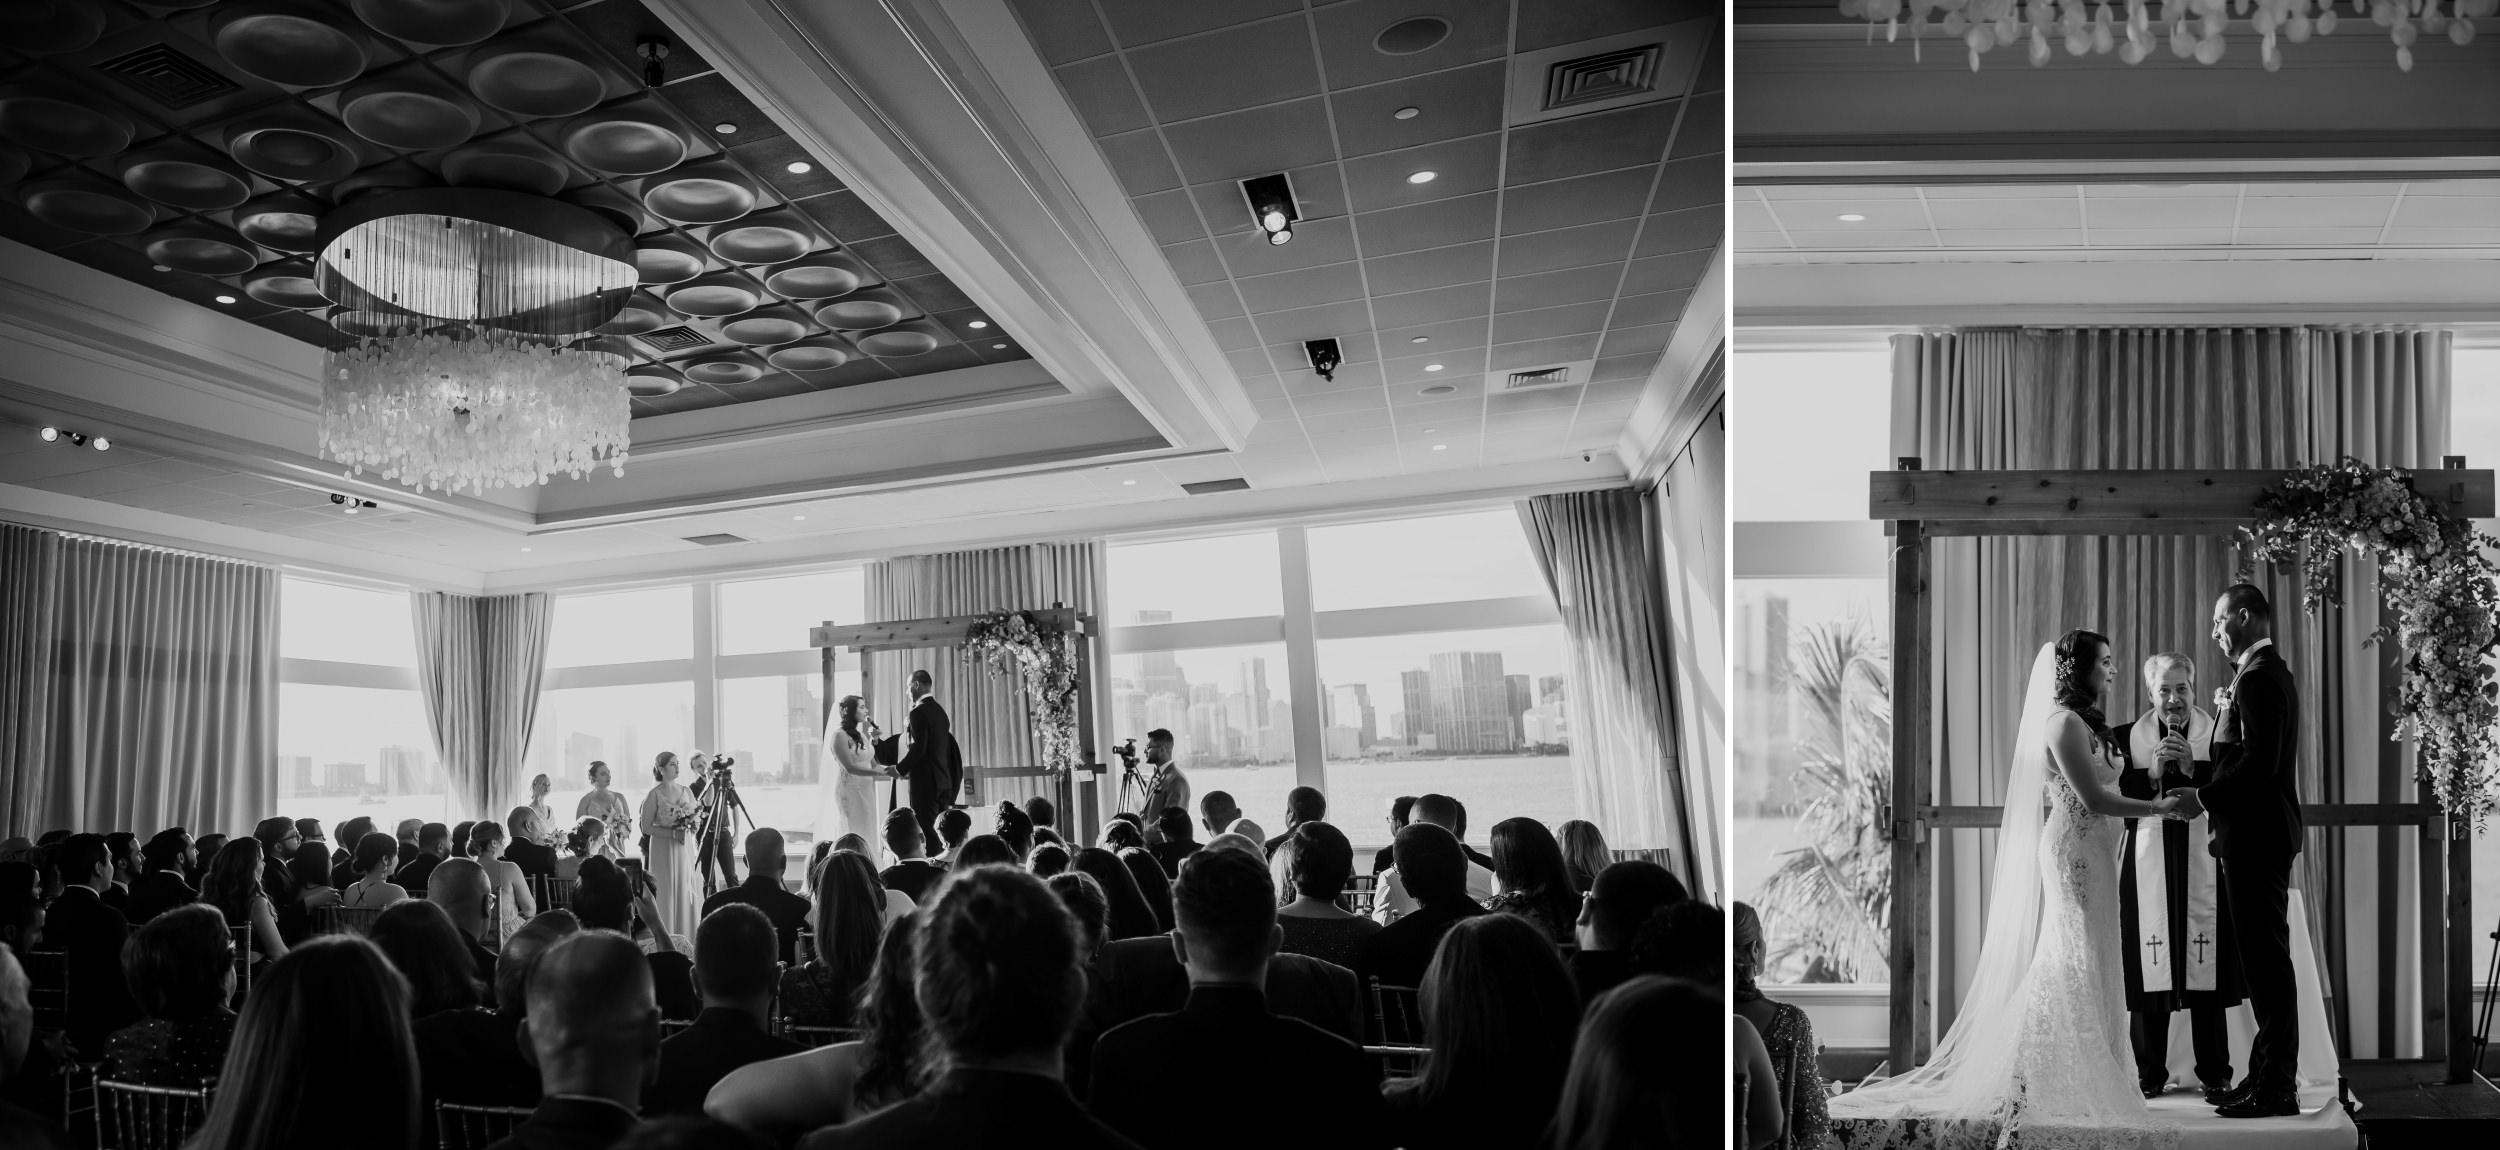 Wedding - Rusty Pelican - Key Biscayne - Santy Martinez Photography 31.jpg